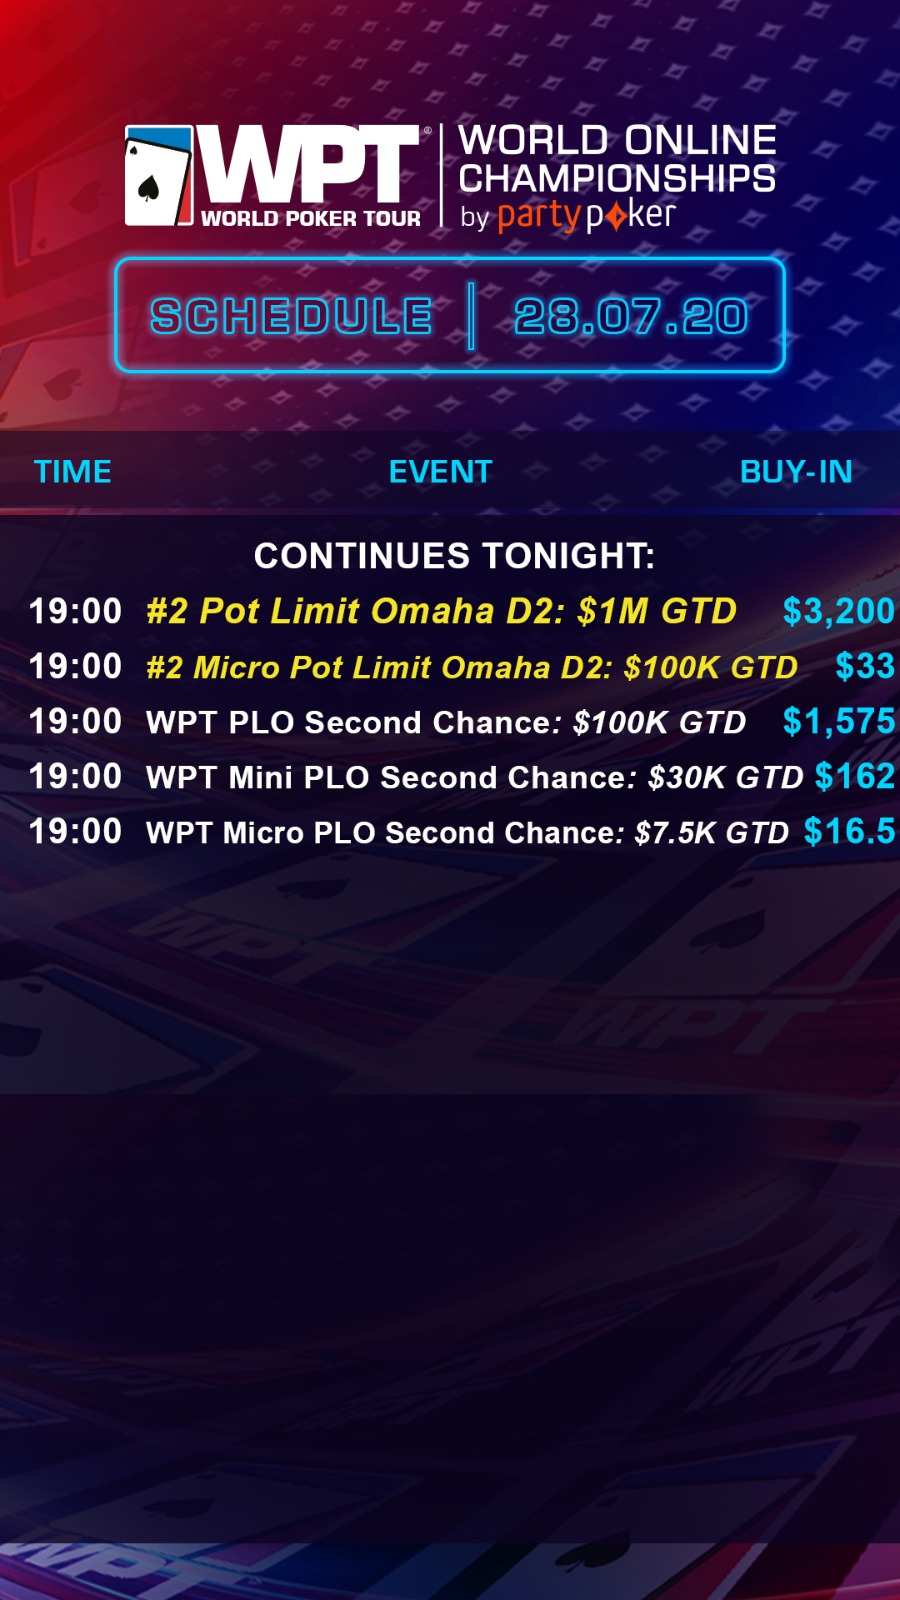 Tonight's schedule